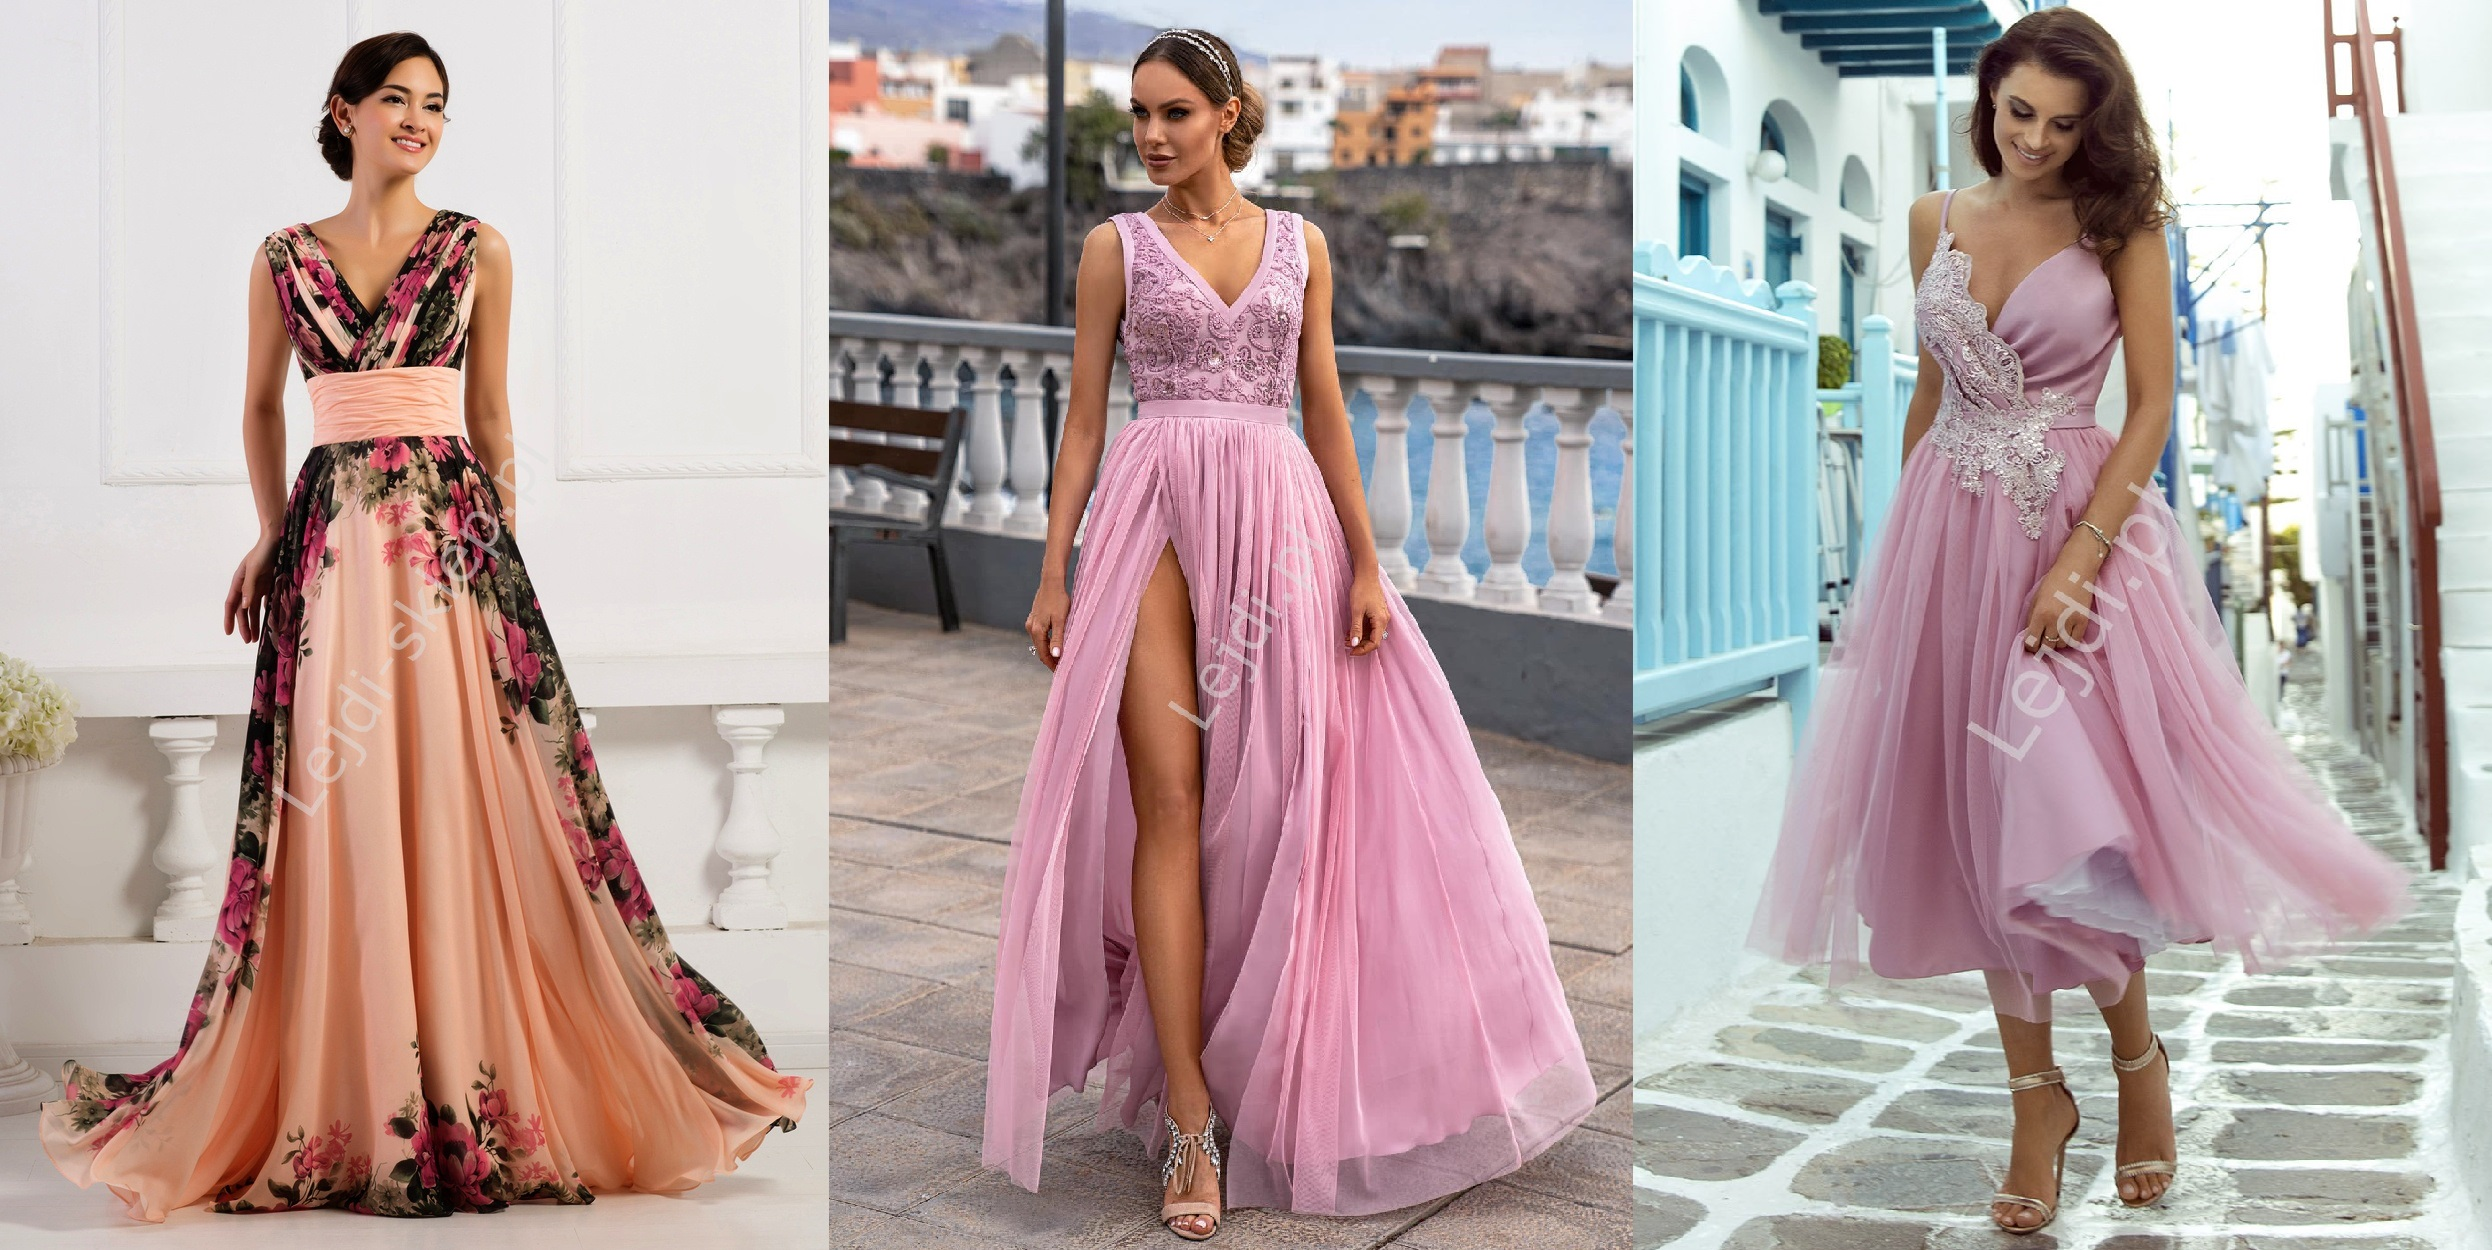 Modne sukienki na wesele trendy 2021